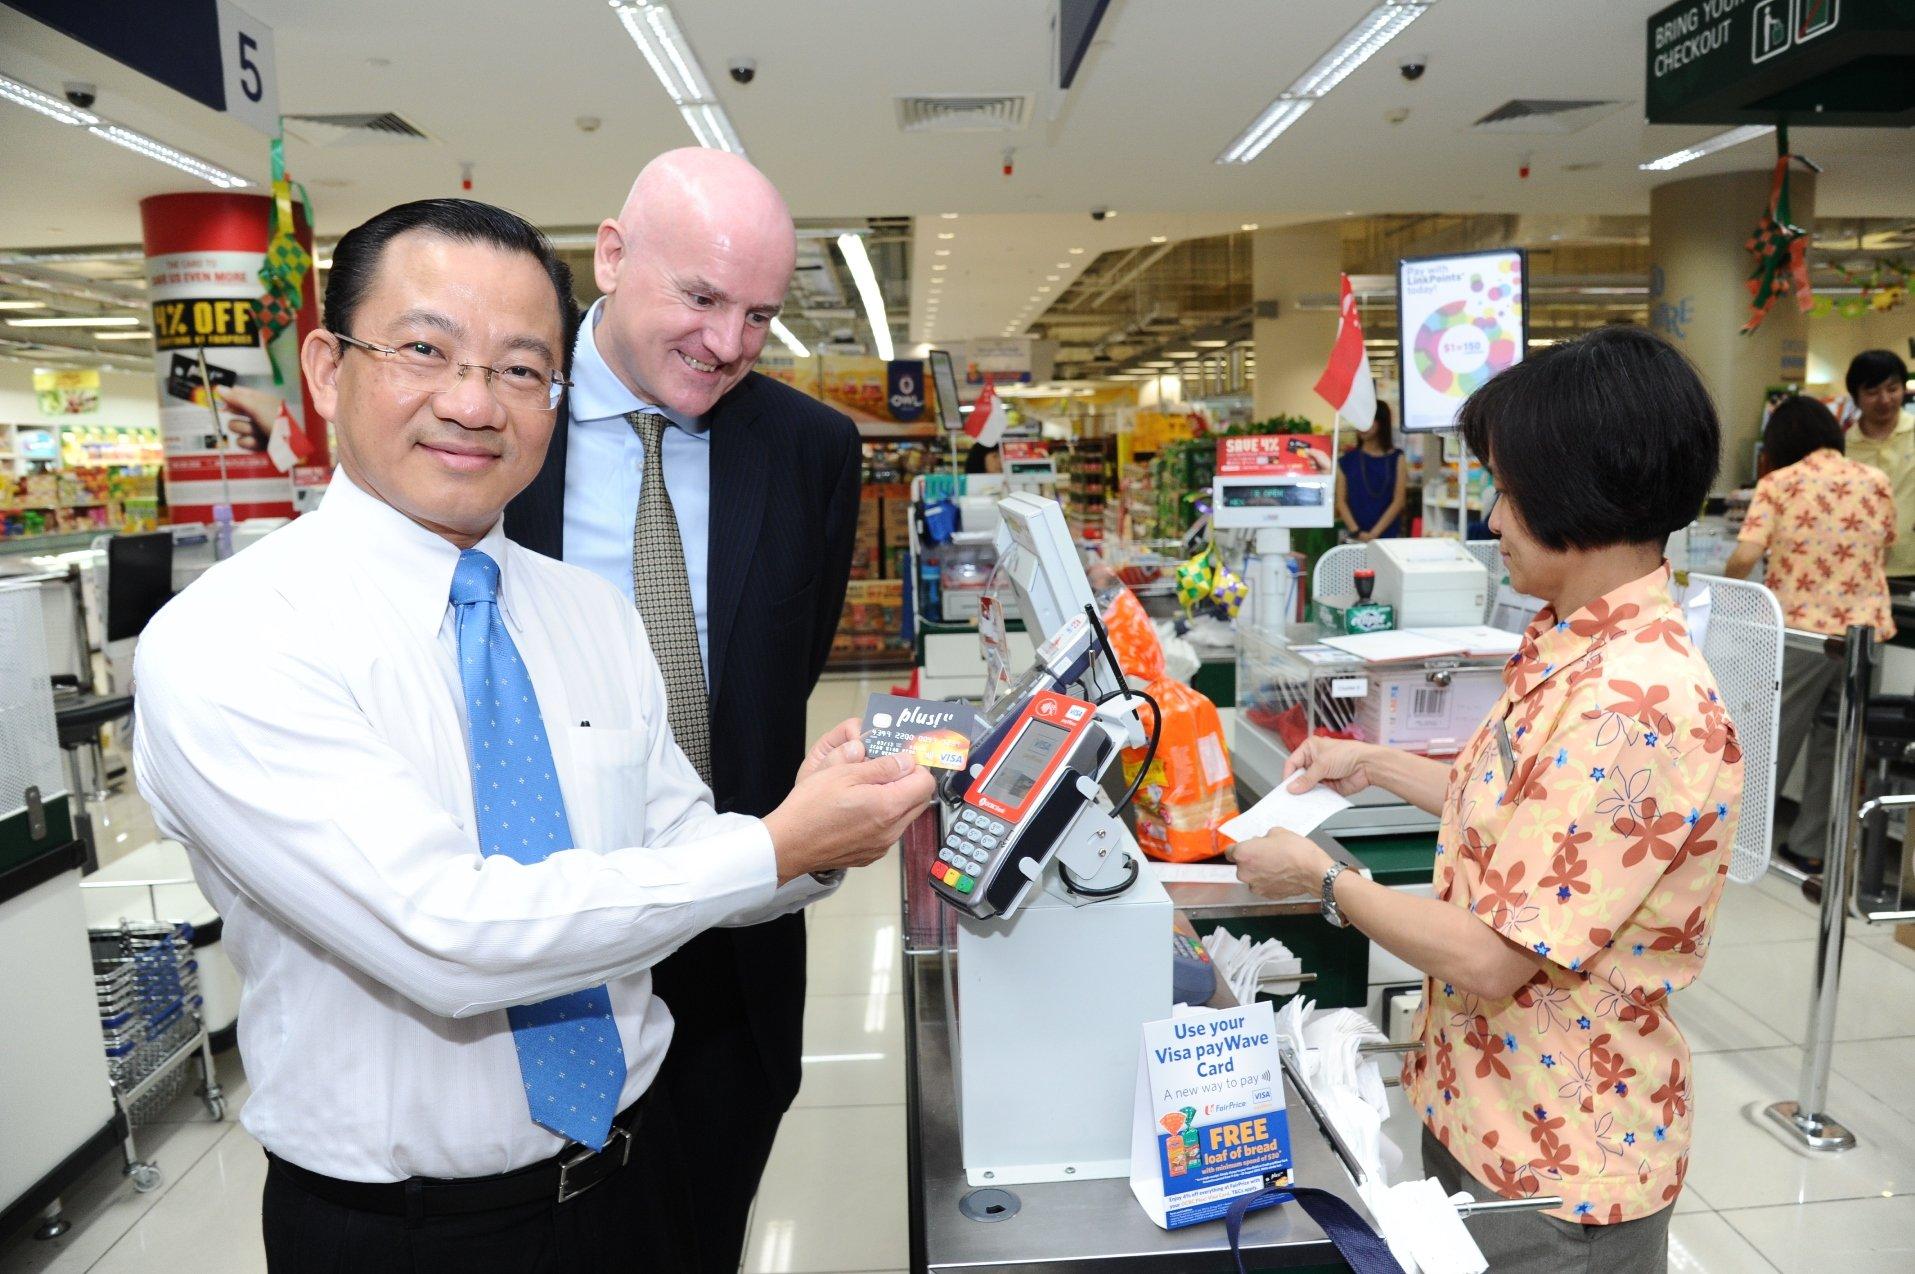 Seah Kian Peng making payment with Peter Maher watching